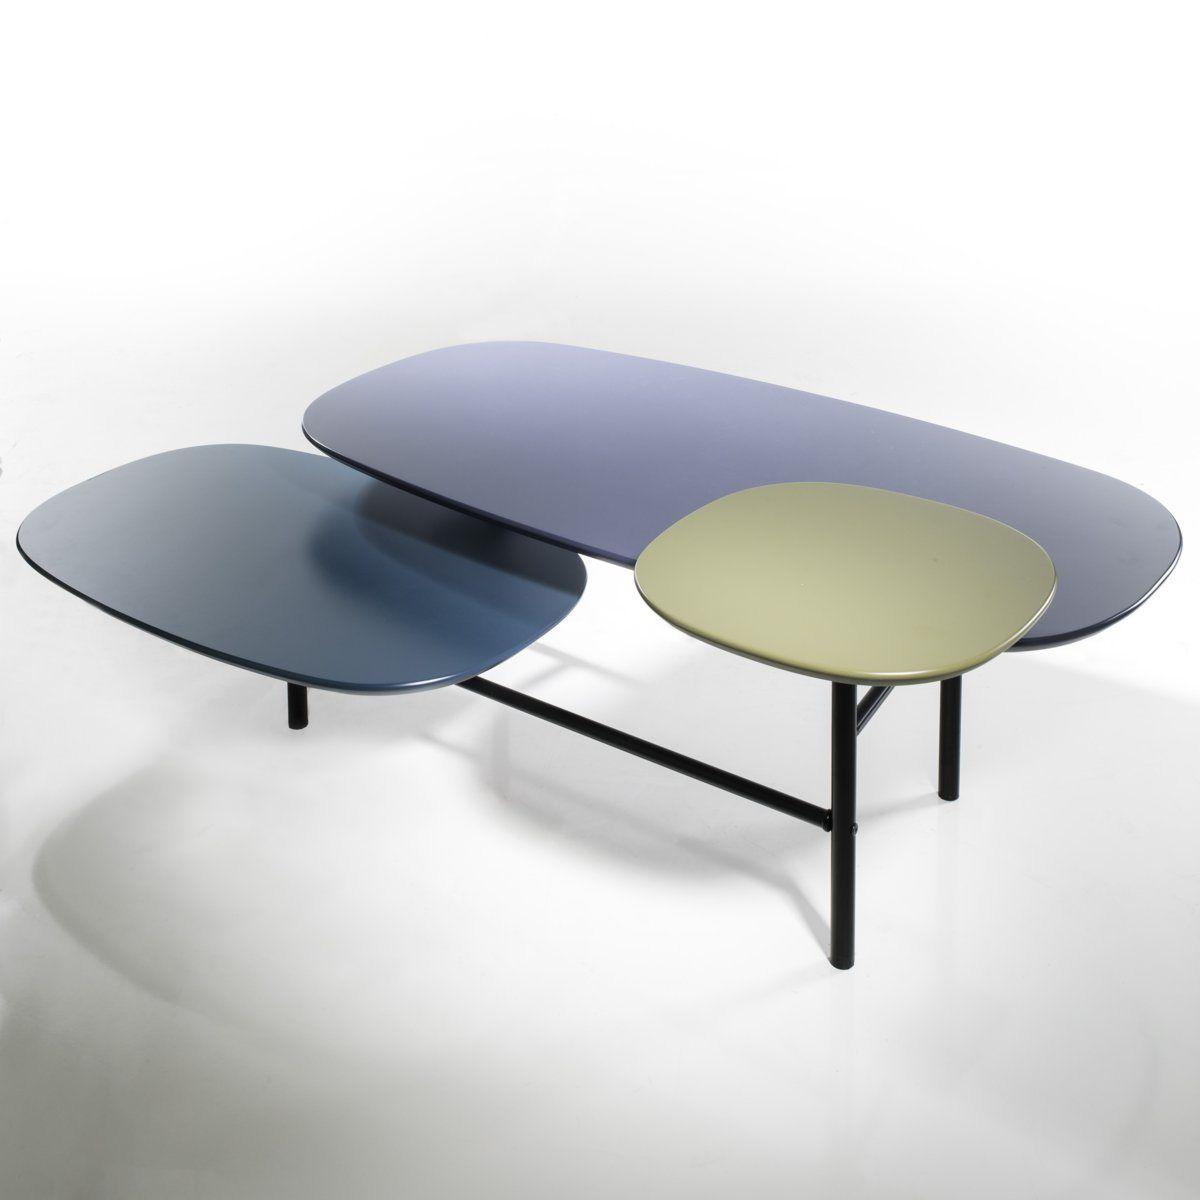 Table Basse 3 Plateaux Guillaume Delvigne La Redoute 200 Dimensions